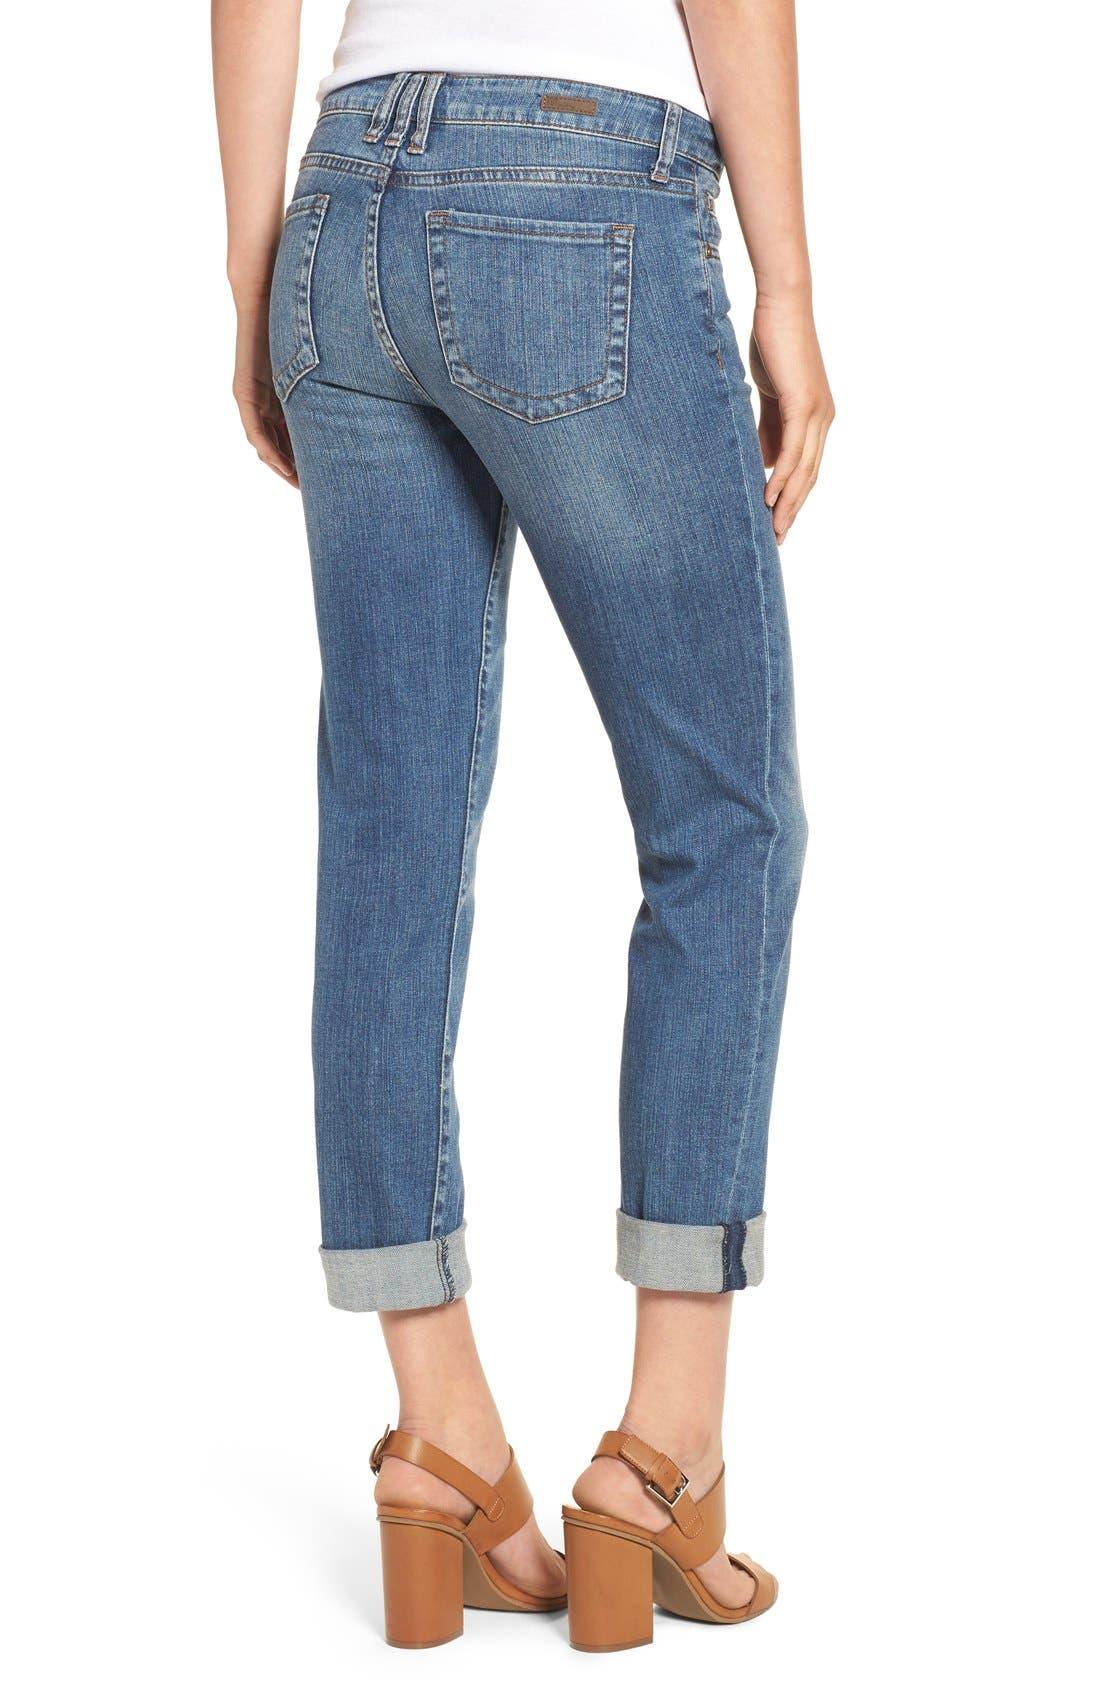 Alternate Image 3  - KUT from the Kloth 'Catherine' Slim Boyfriend Jeans (Fervent) (Regular & Petite)